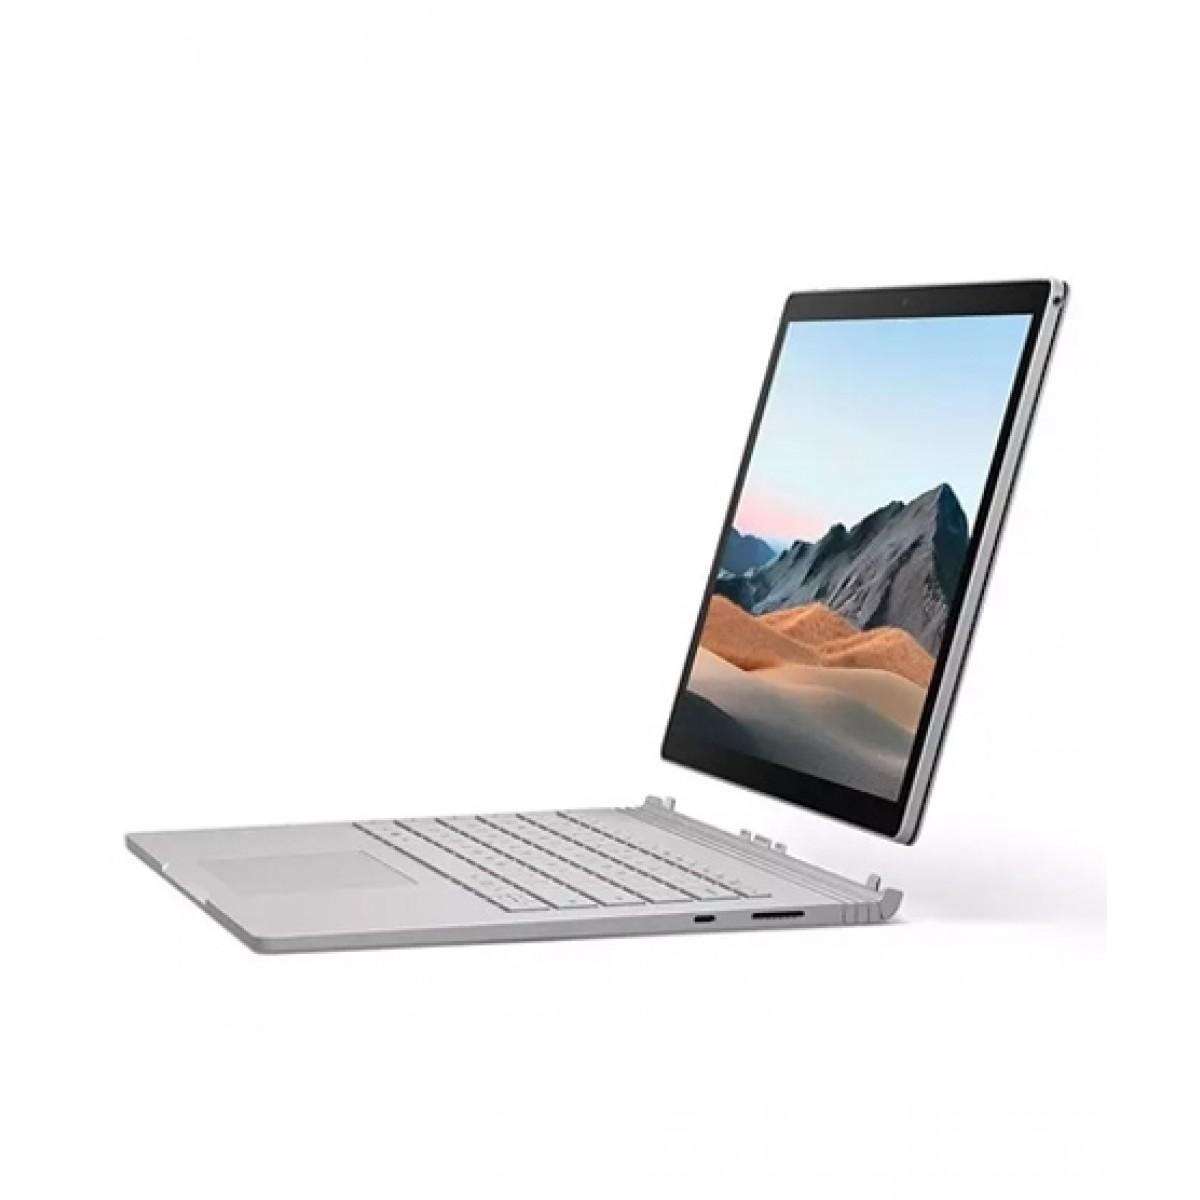 Microsoft Surface Book 3 13.5 Core i5 10th Gen 256GB SSD 8GB Platinum